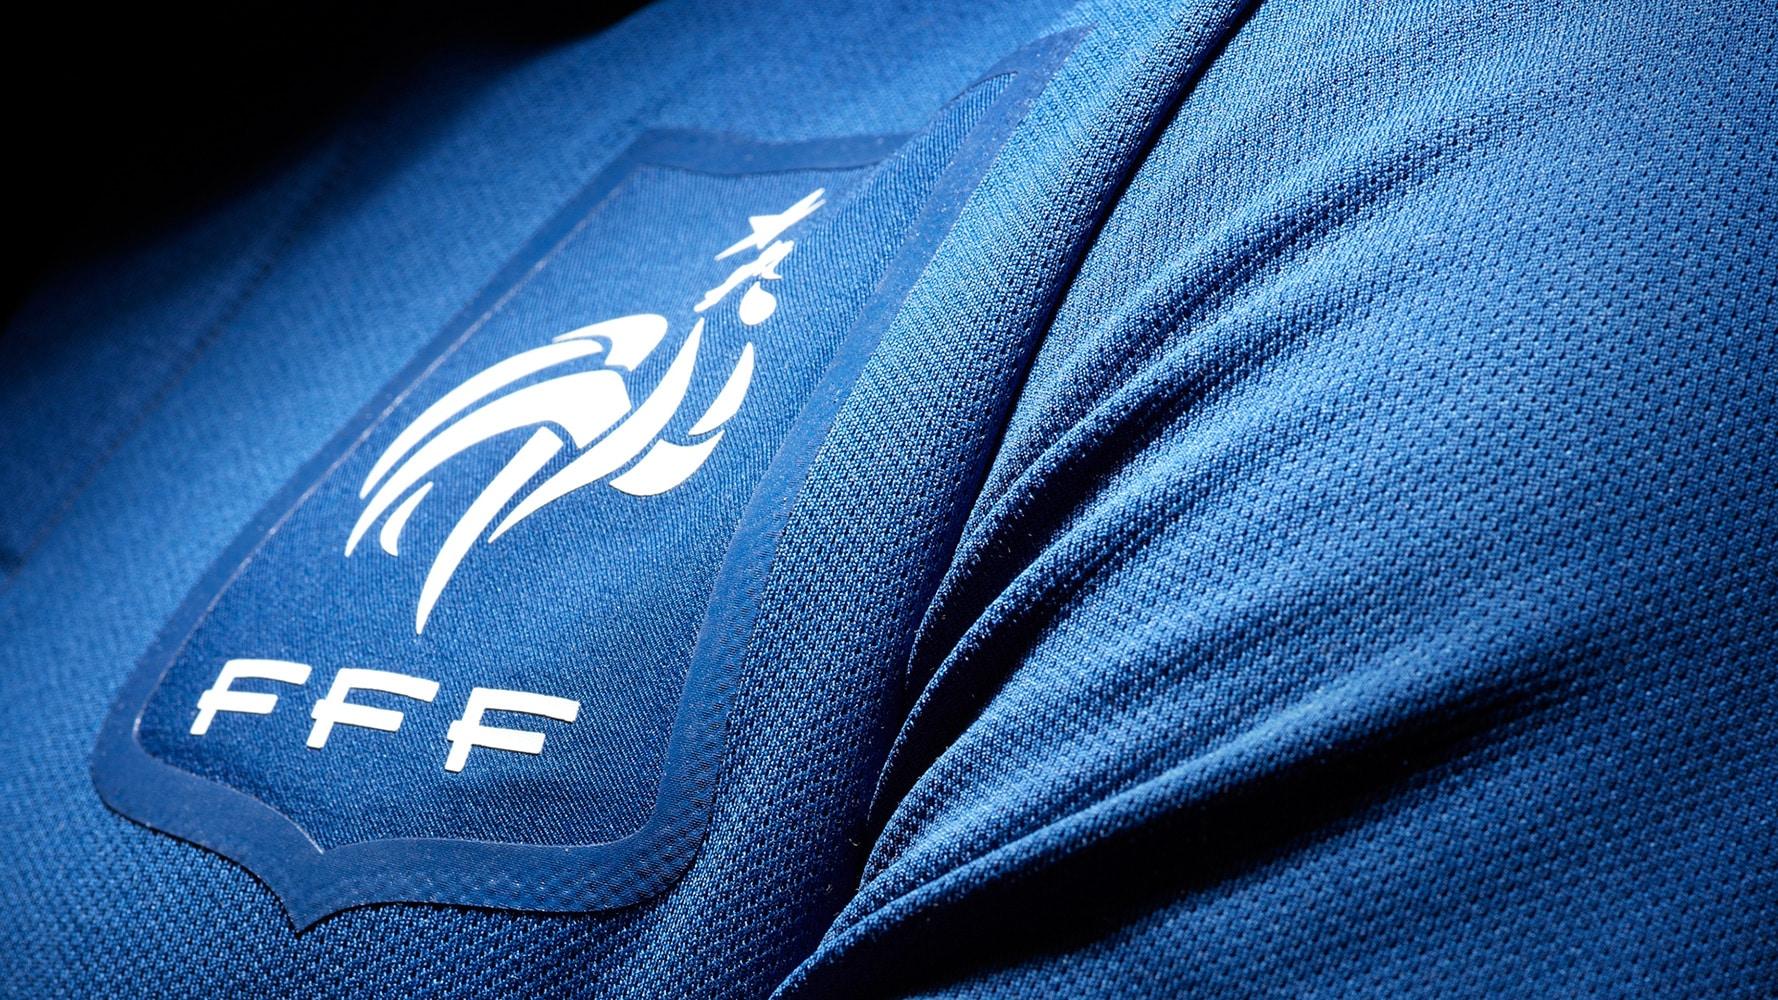 Federation football amateur